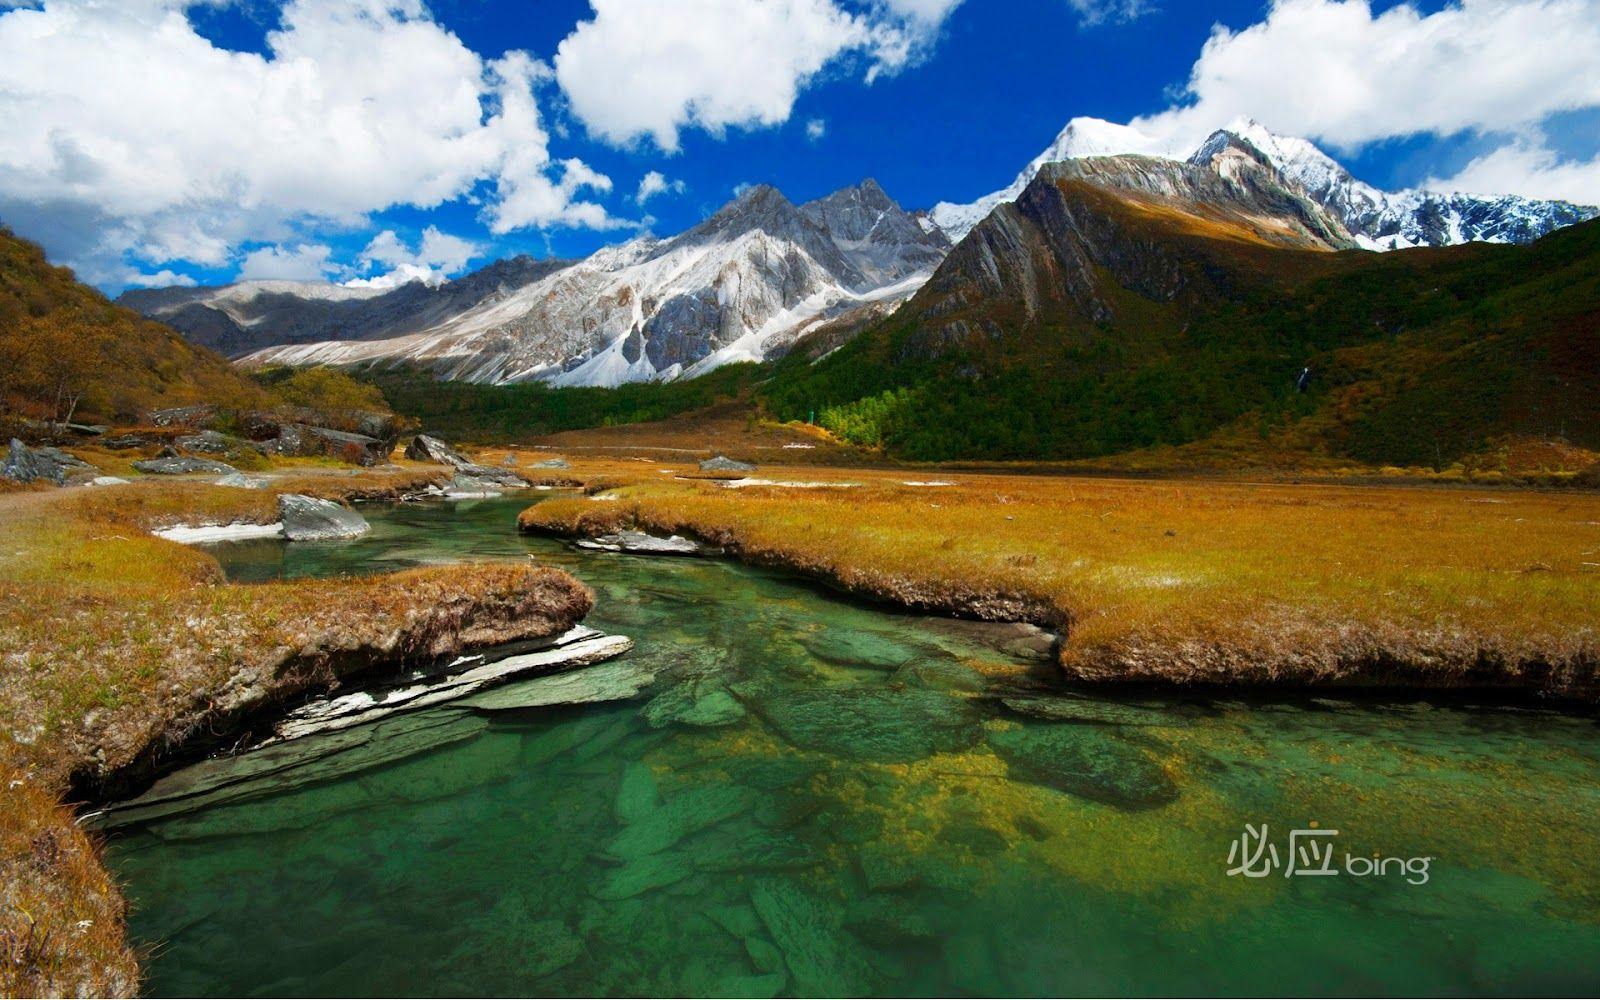 Beautiful Scenery Hd Wallpapers Free Download - Hd Scenery Wallpapers For Laptop , HD Wallpaper & Backgrounds